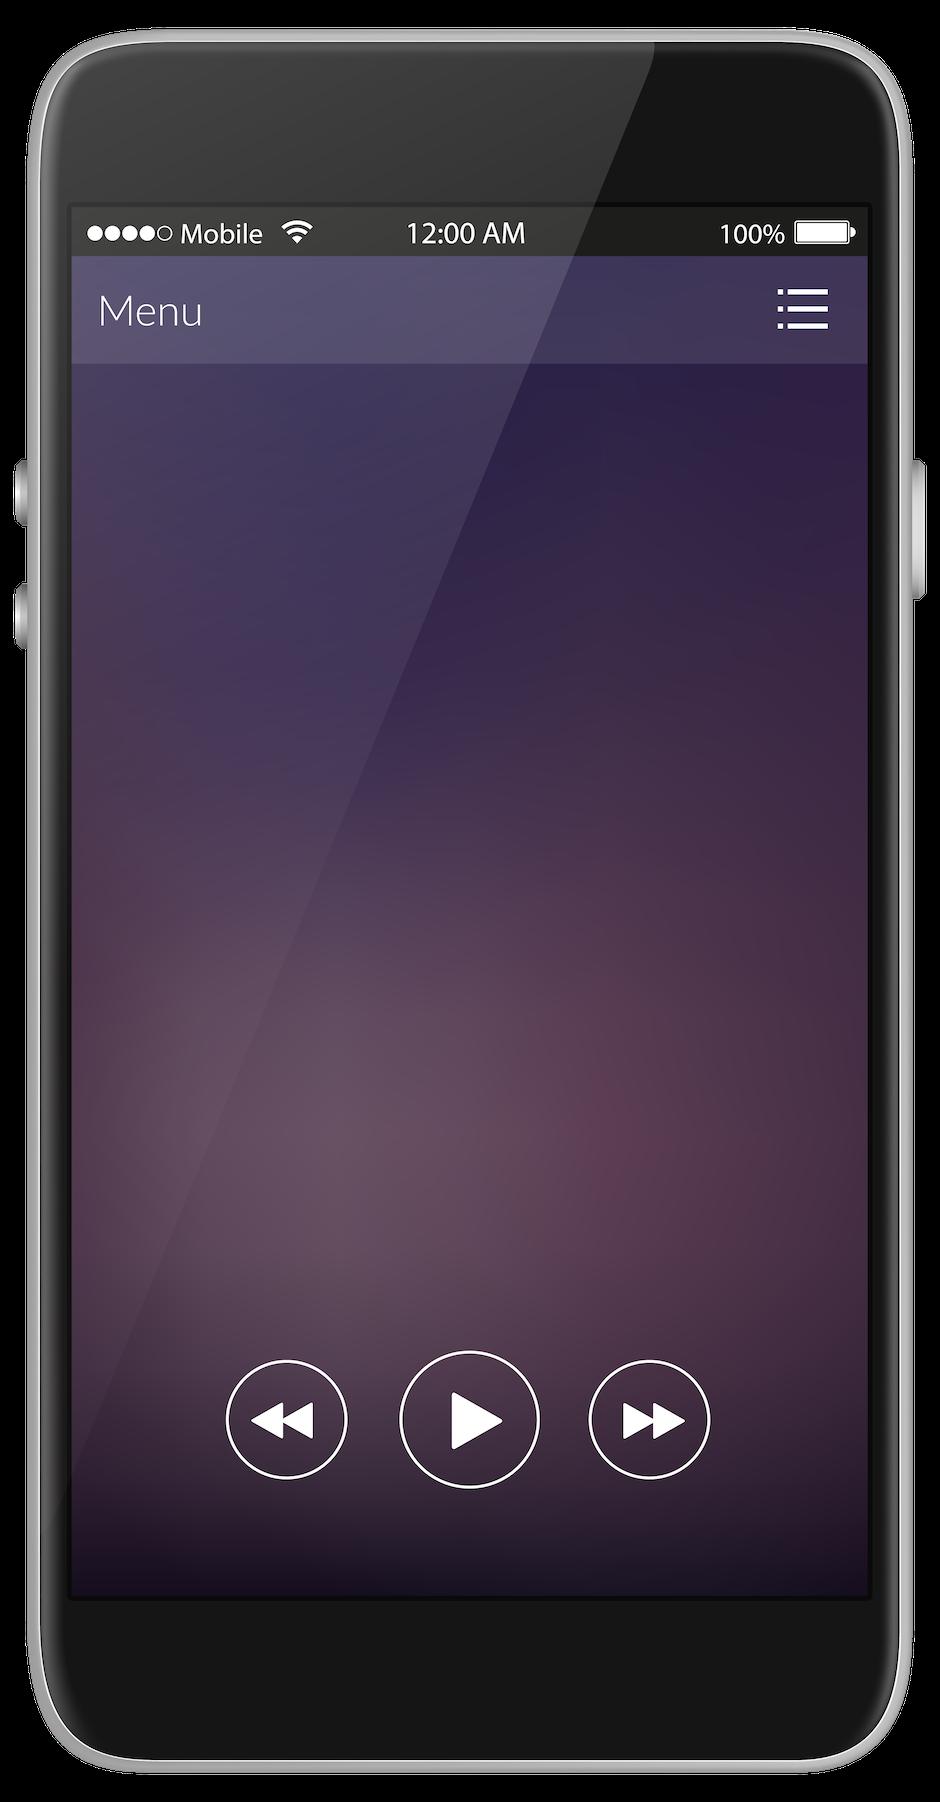 apps, cellular telephone, communication